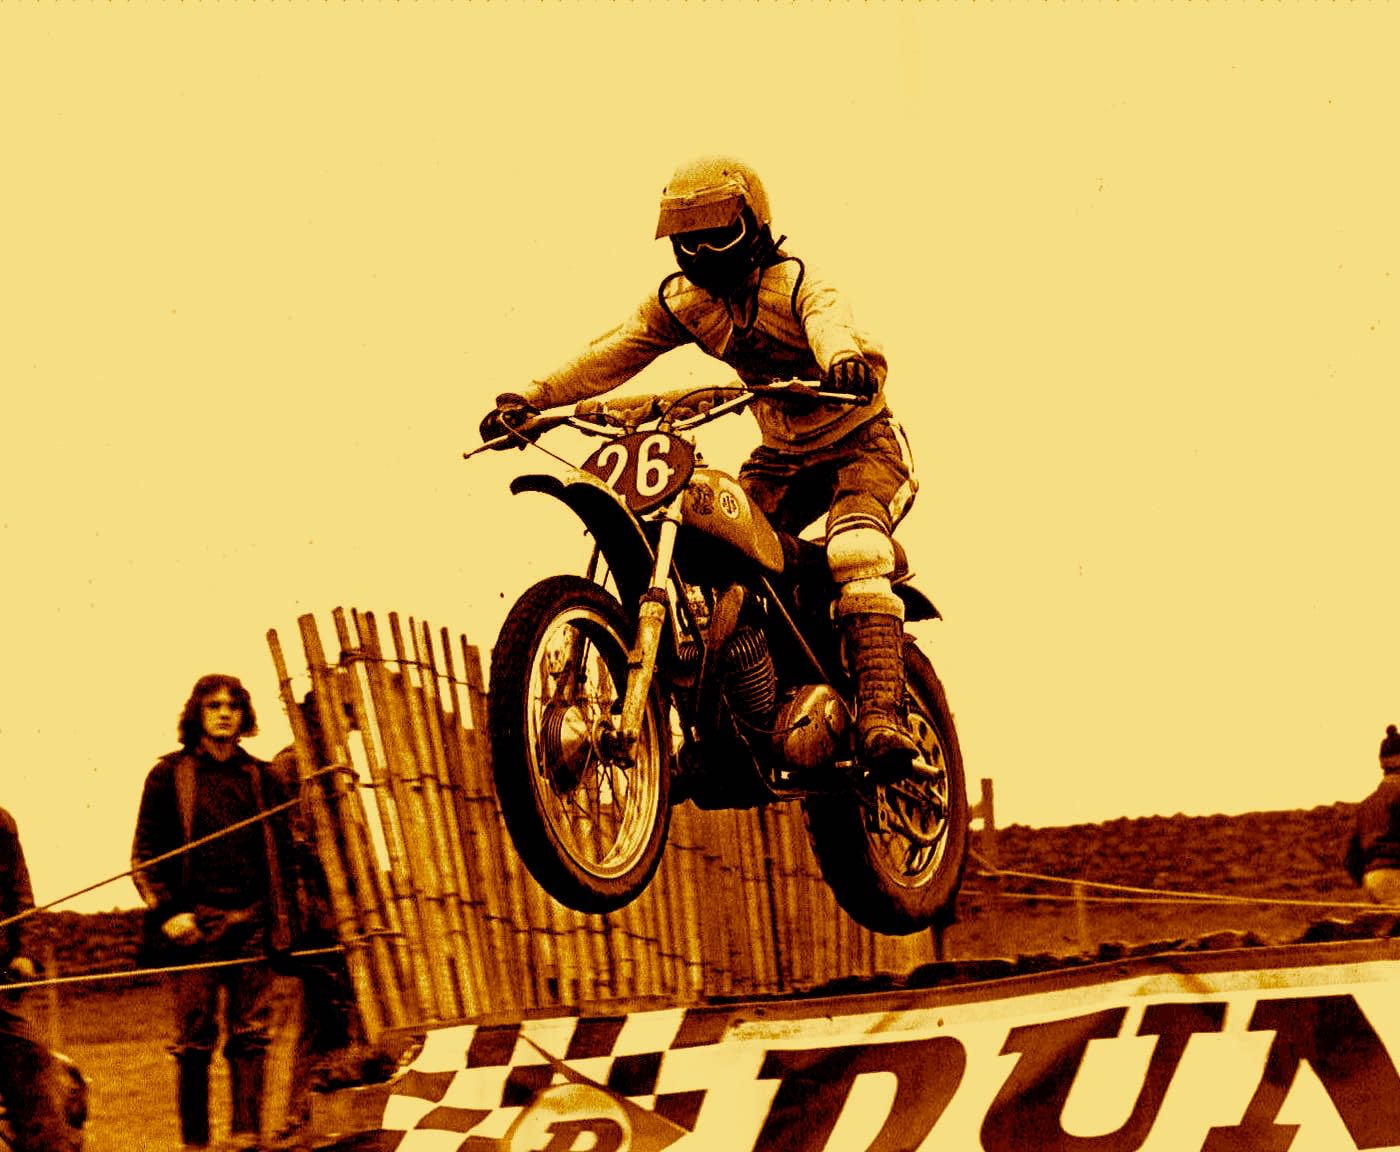 Paul Barton 1974